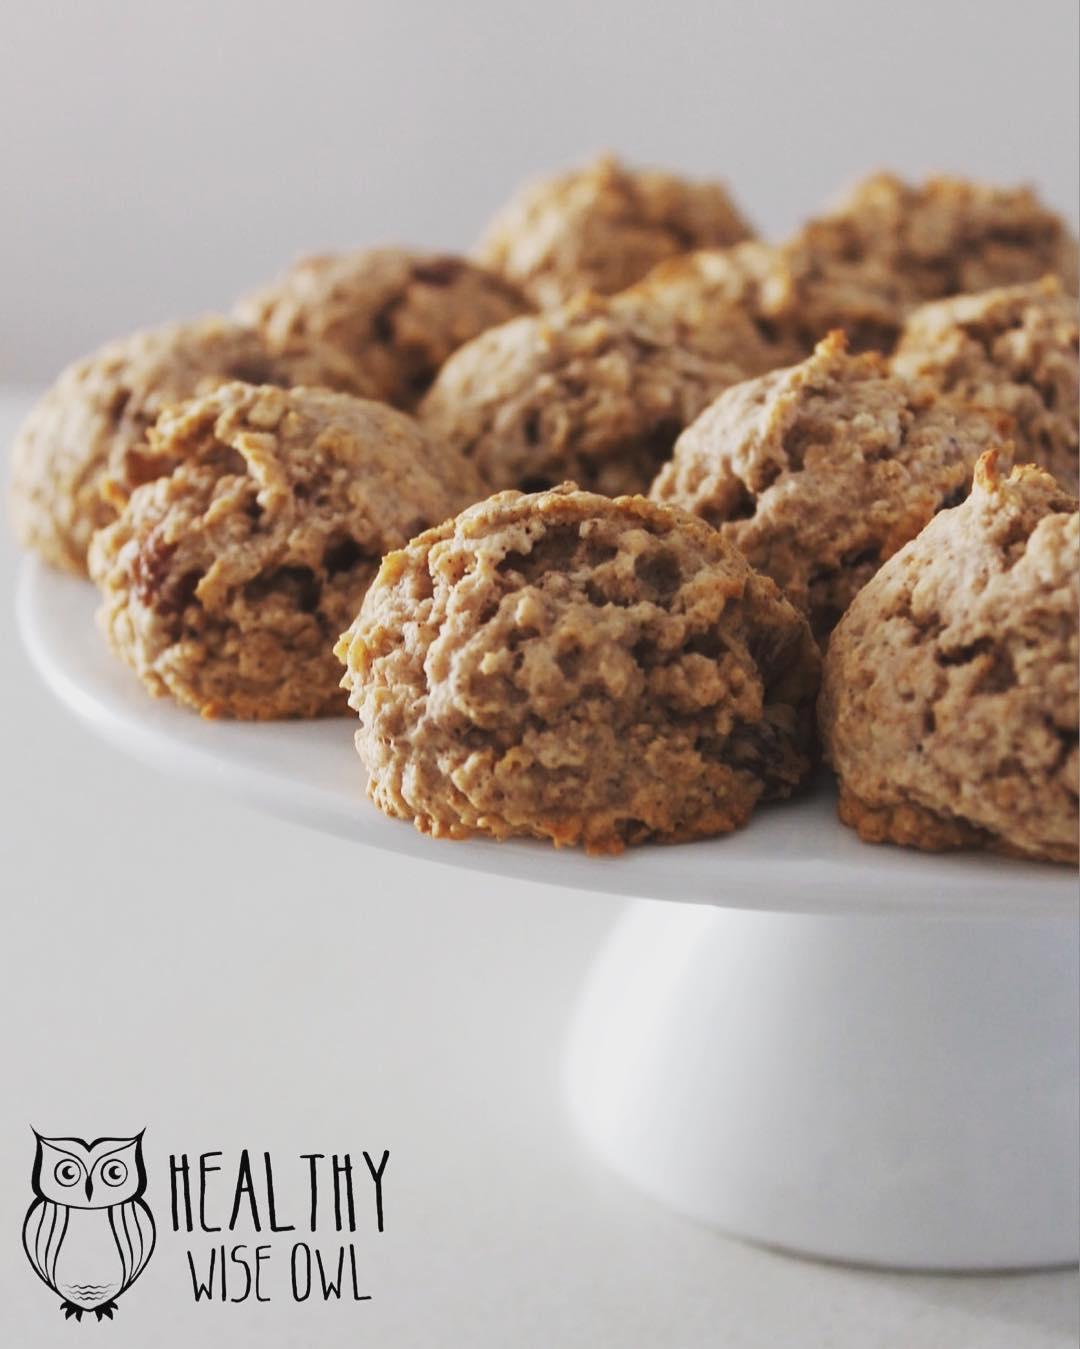 healthy oatmeal raisin breakfast cookies by @healthywiseowl